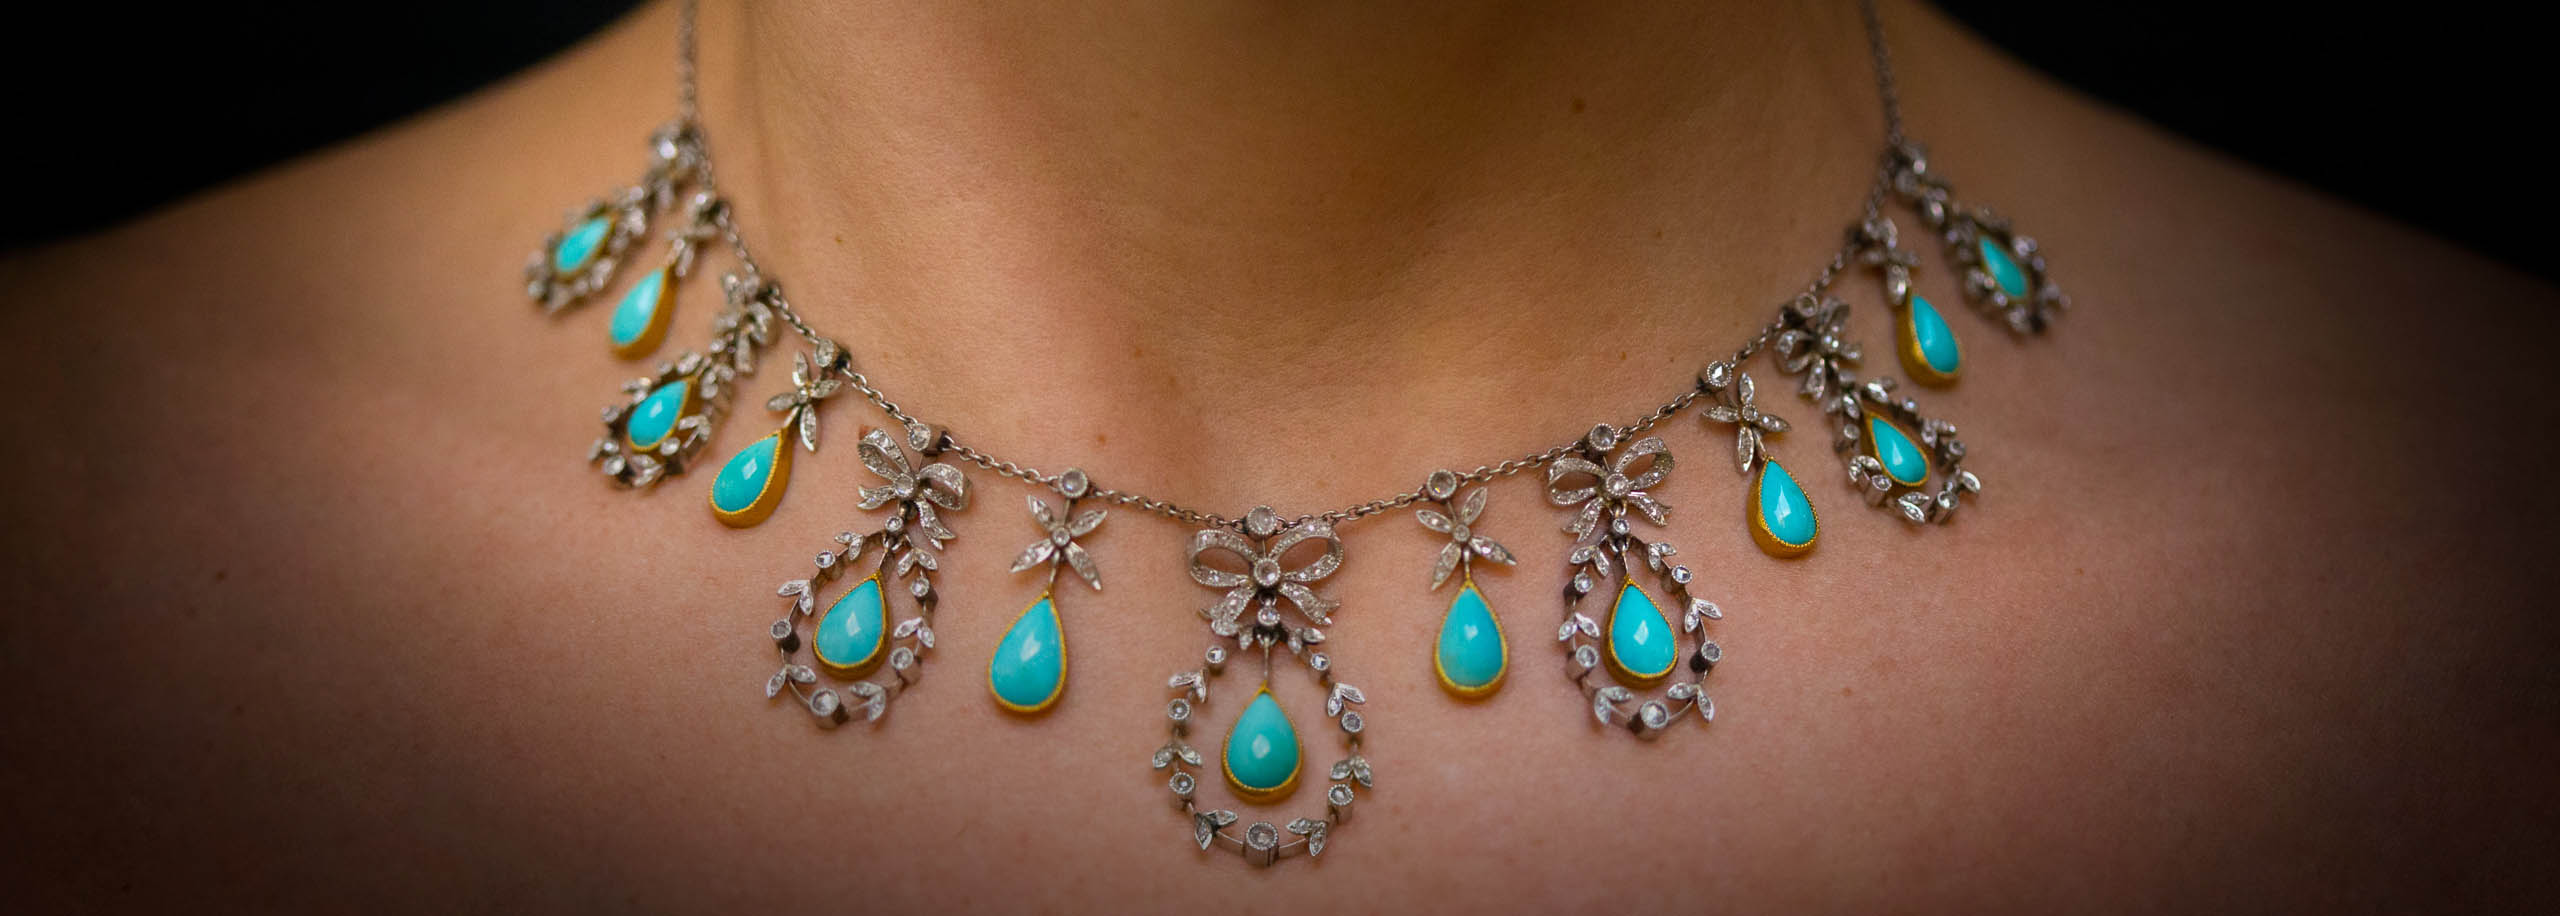 289cde8a8f081 Necklaces: Vintage & Antique Necklaces. Diamond Necklaces | Lang